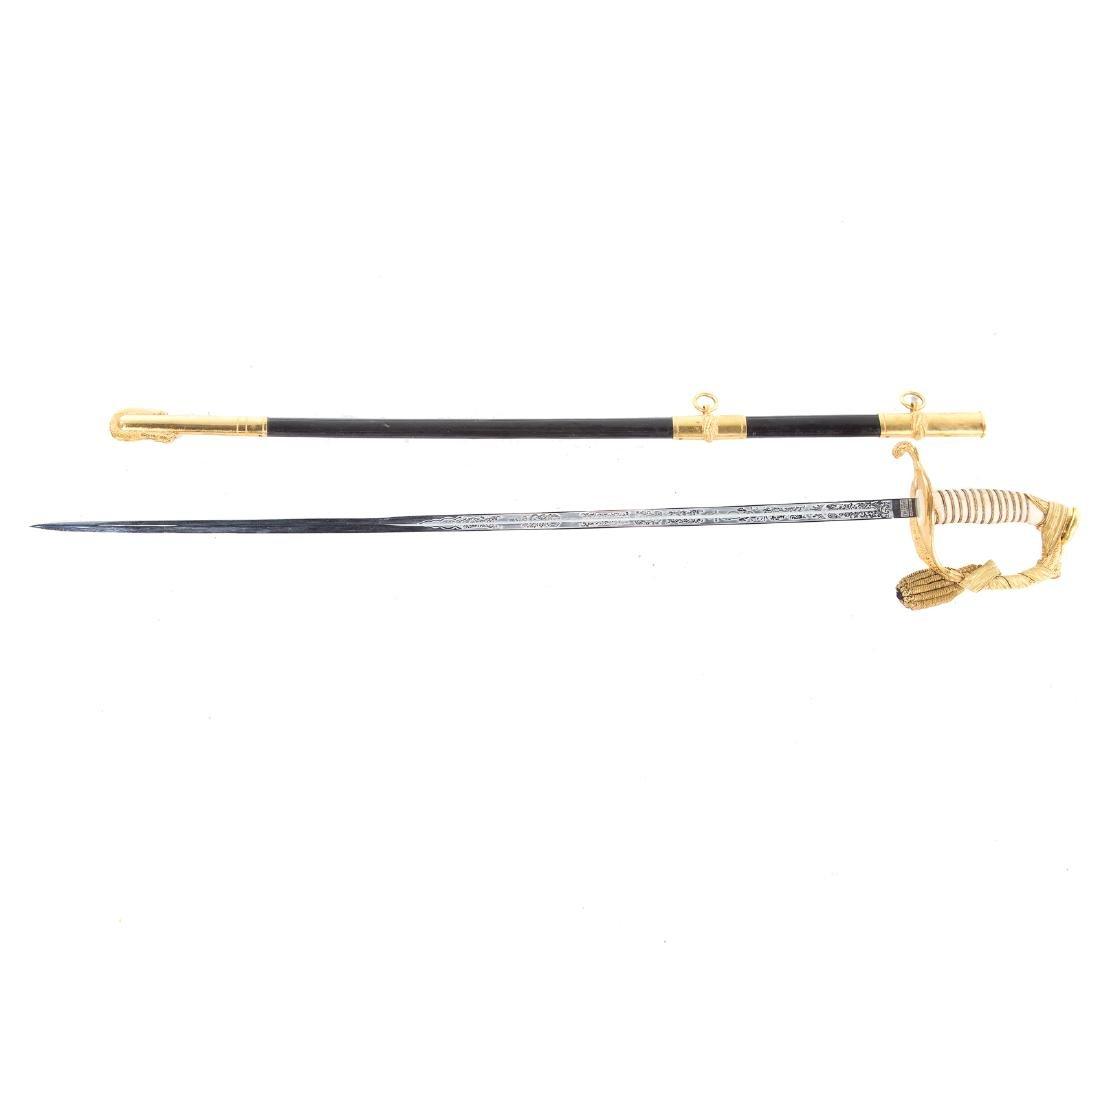 N.S. Meyer U.S. Navy Officer sword - 4